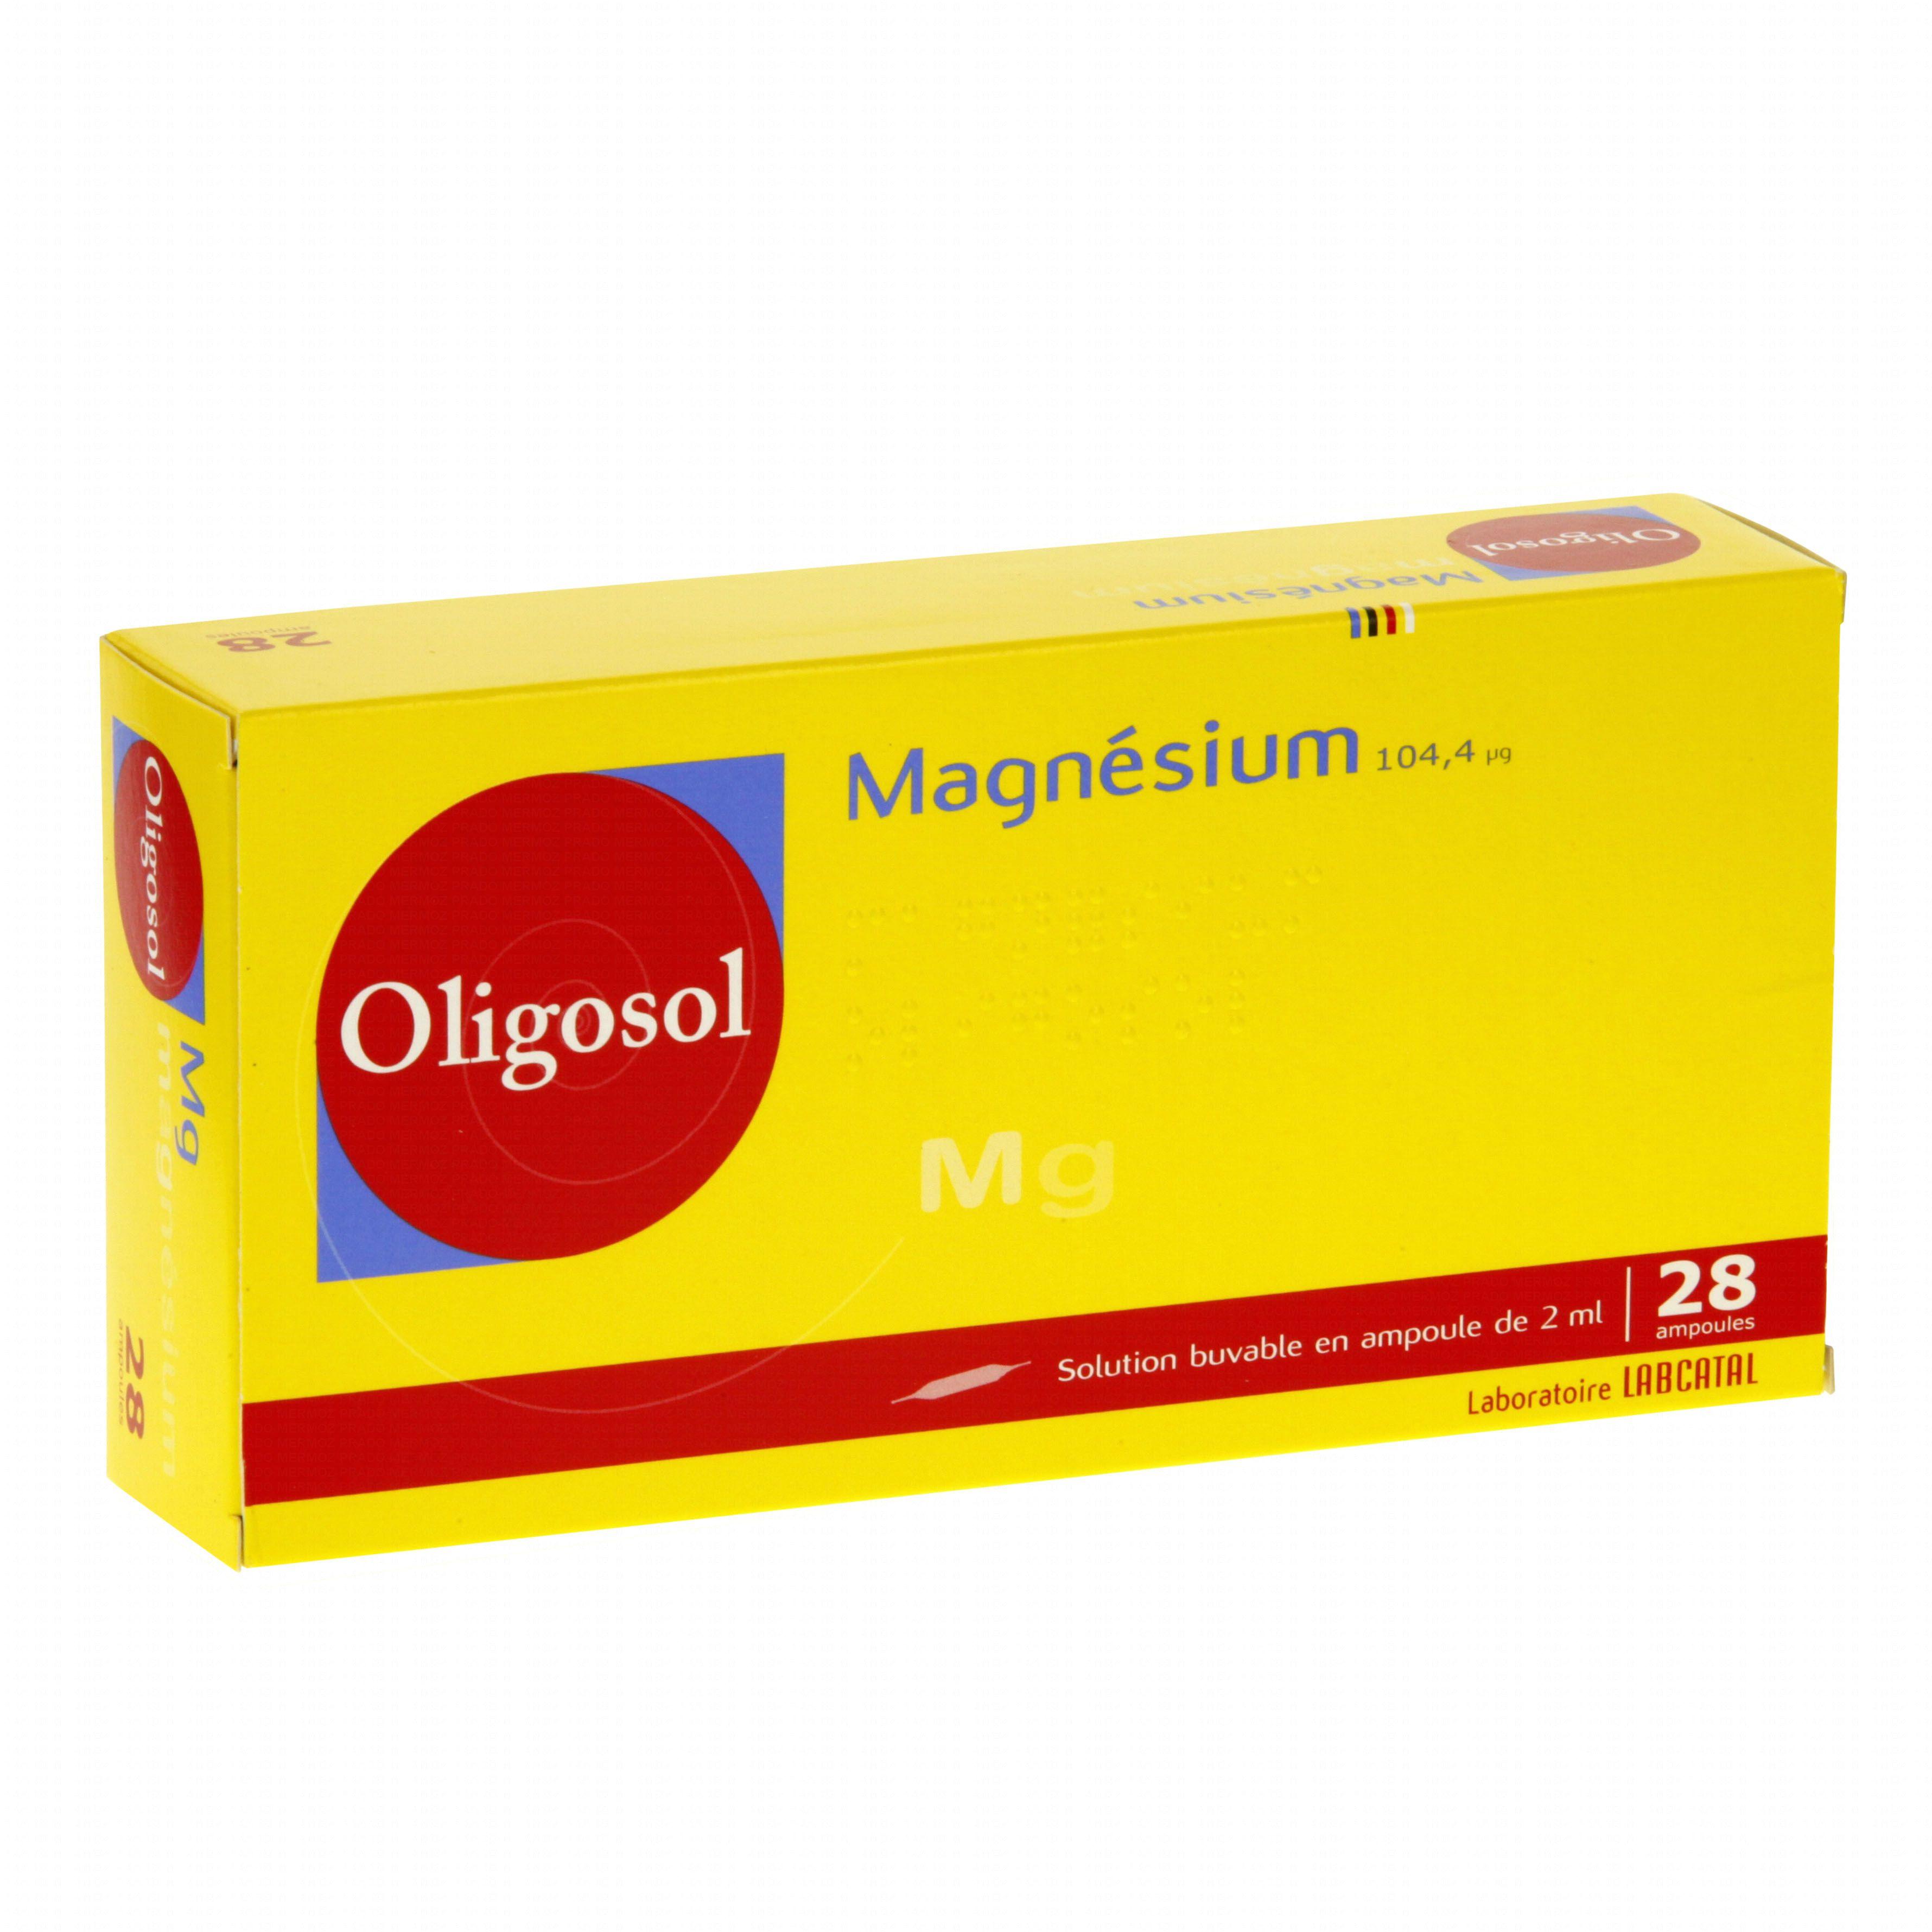 magnesium oligosol bo te de 28 ampoules labcatal. Black Bedroom Furniture Sets. Home Design Ideas